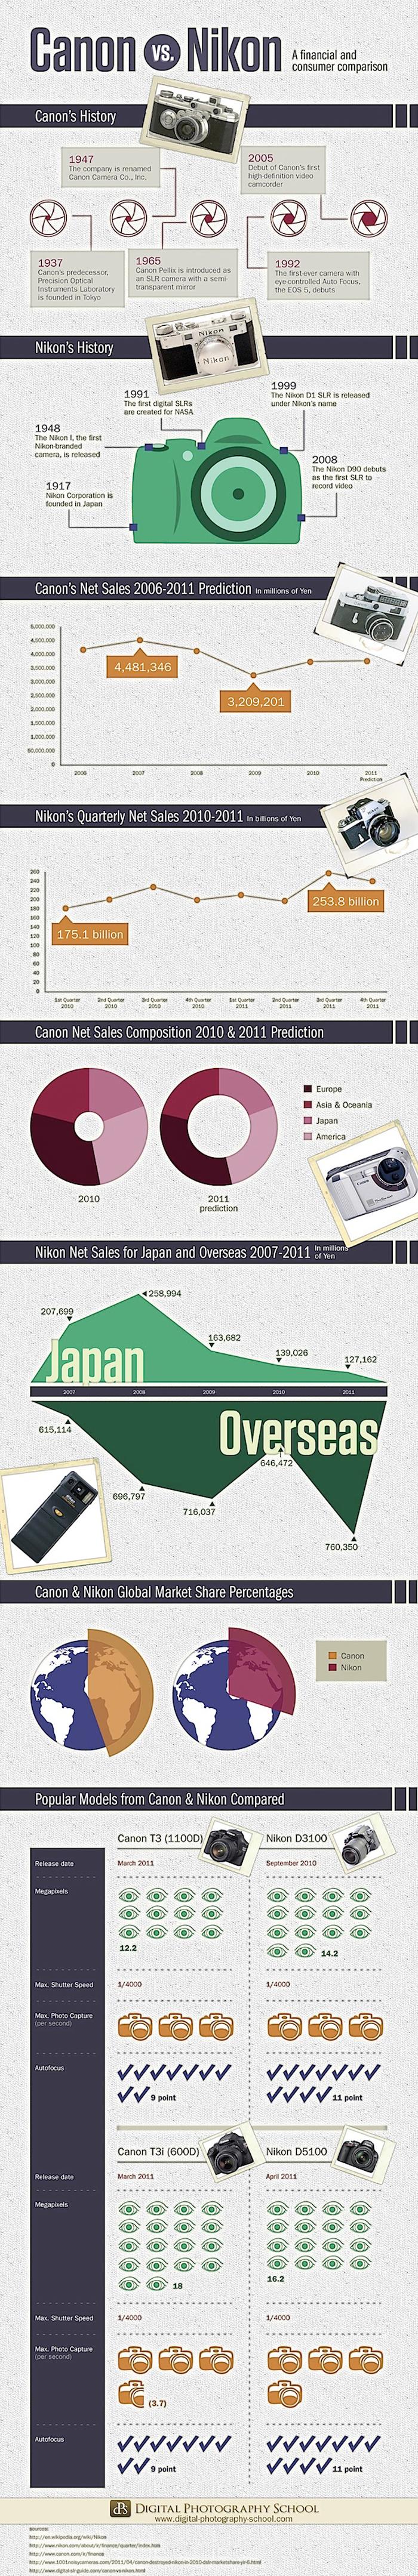 Canon vs Nikon: Financial Sales